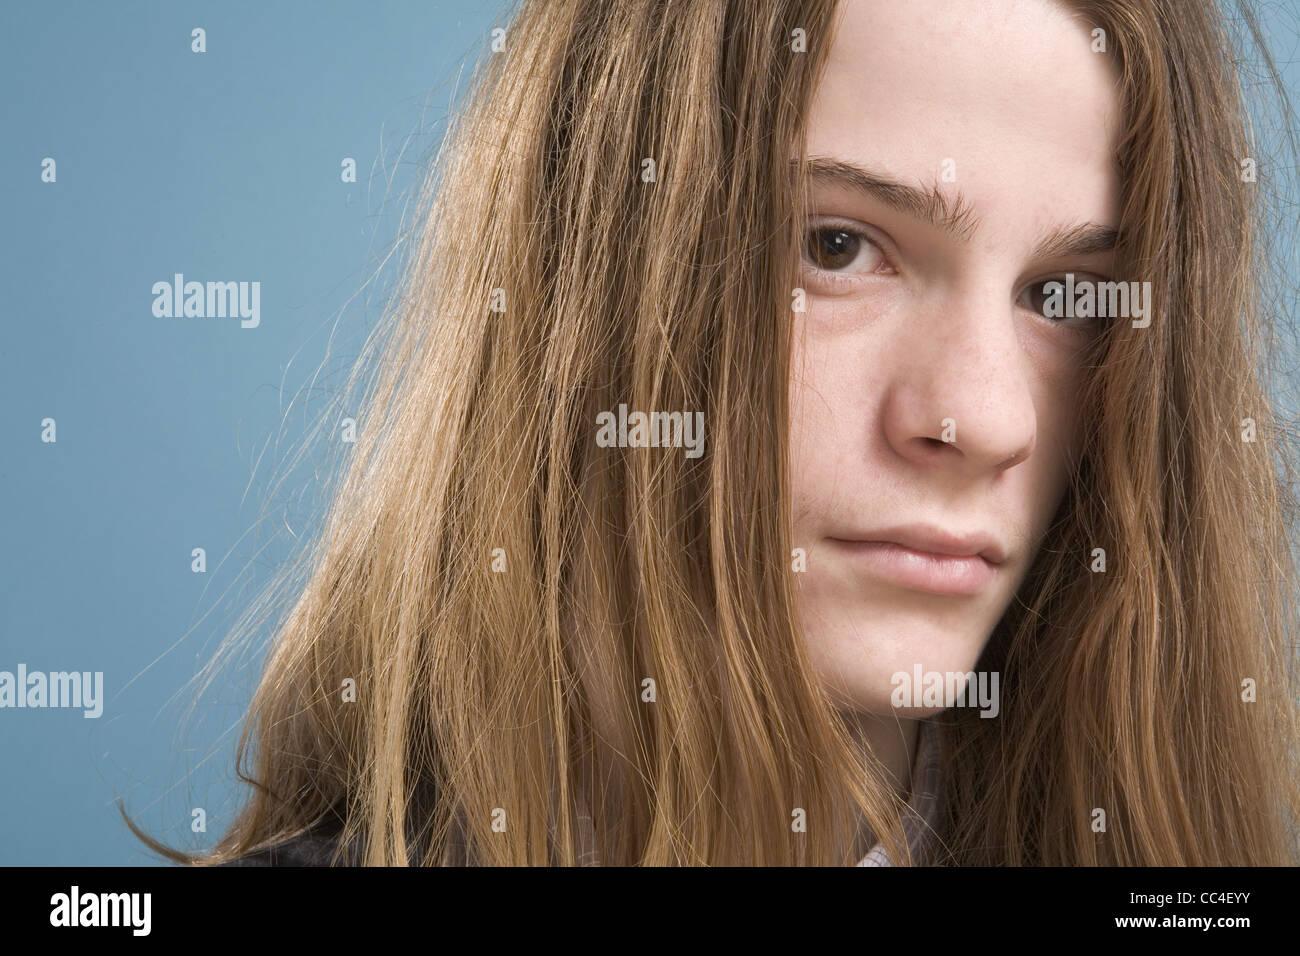 Teens With Long Hair 63